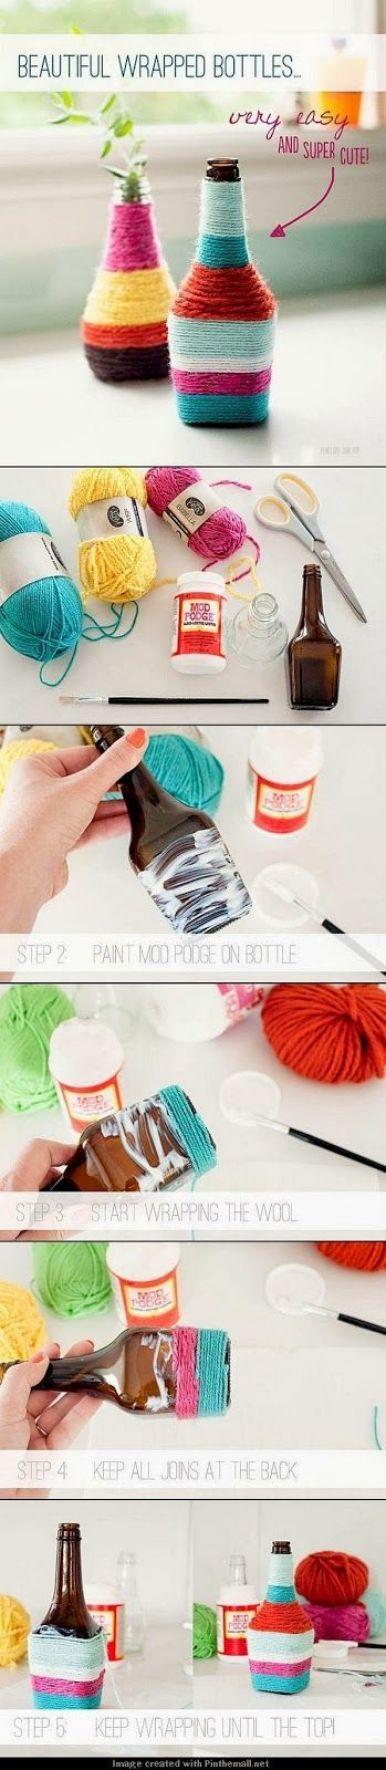 Yarn wrapped bottles are a great DIY dorm room decor idea!